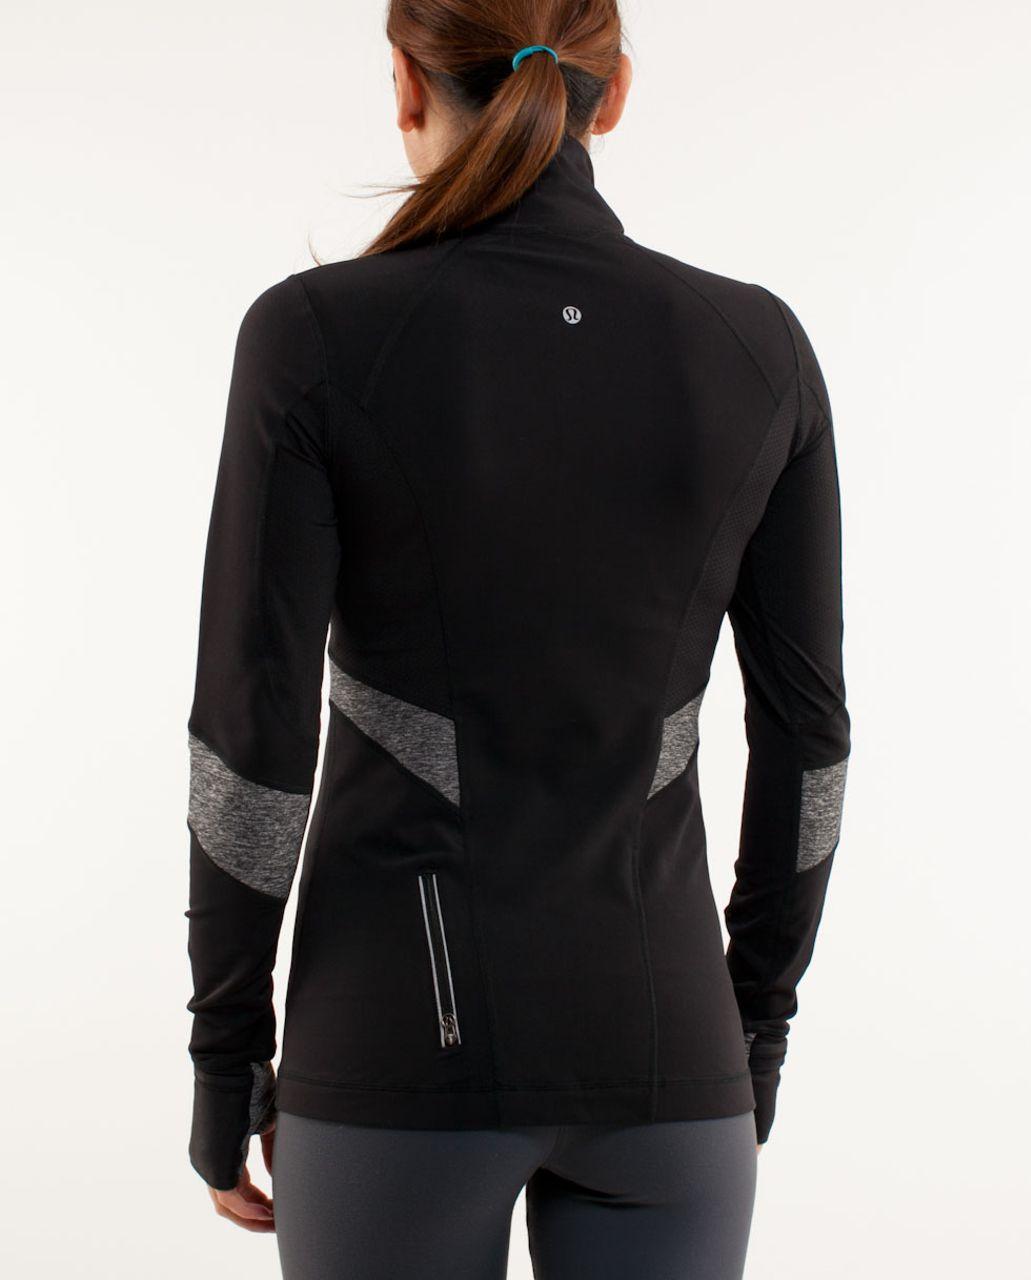 Lululemon Run:  Distance Pullover - Black /  Heathered Black